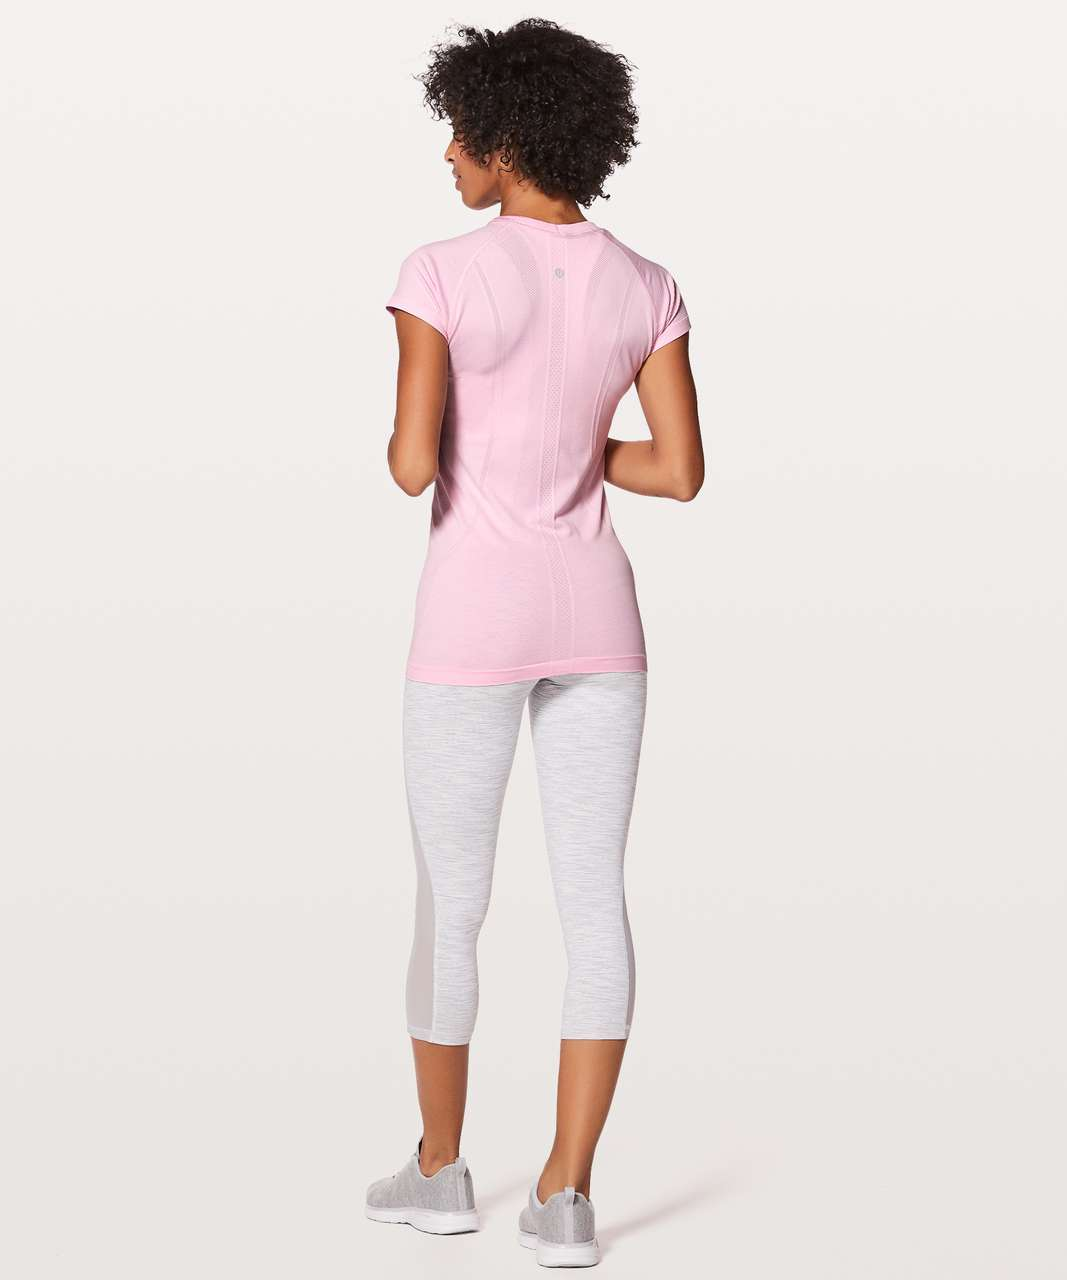 Lululemon Swiftly Tech Short Sleeve Crew - Pearl Pink / Pearl Pink